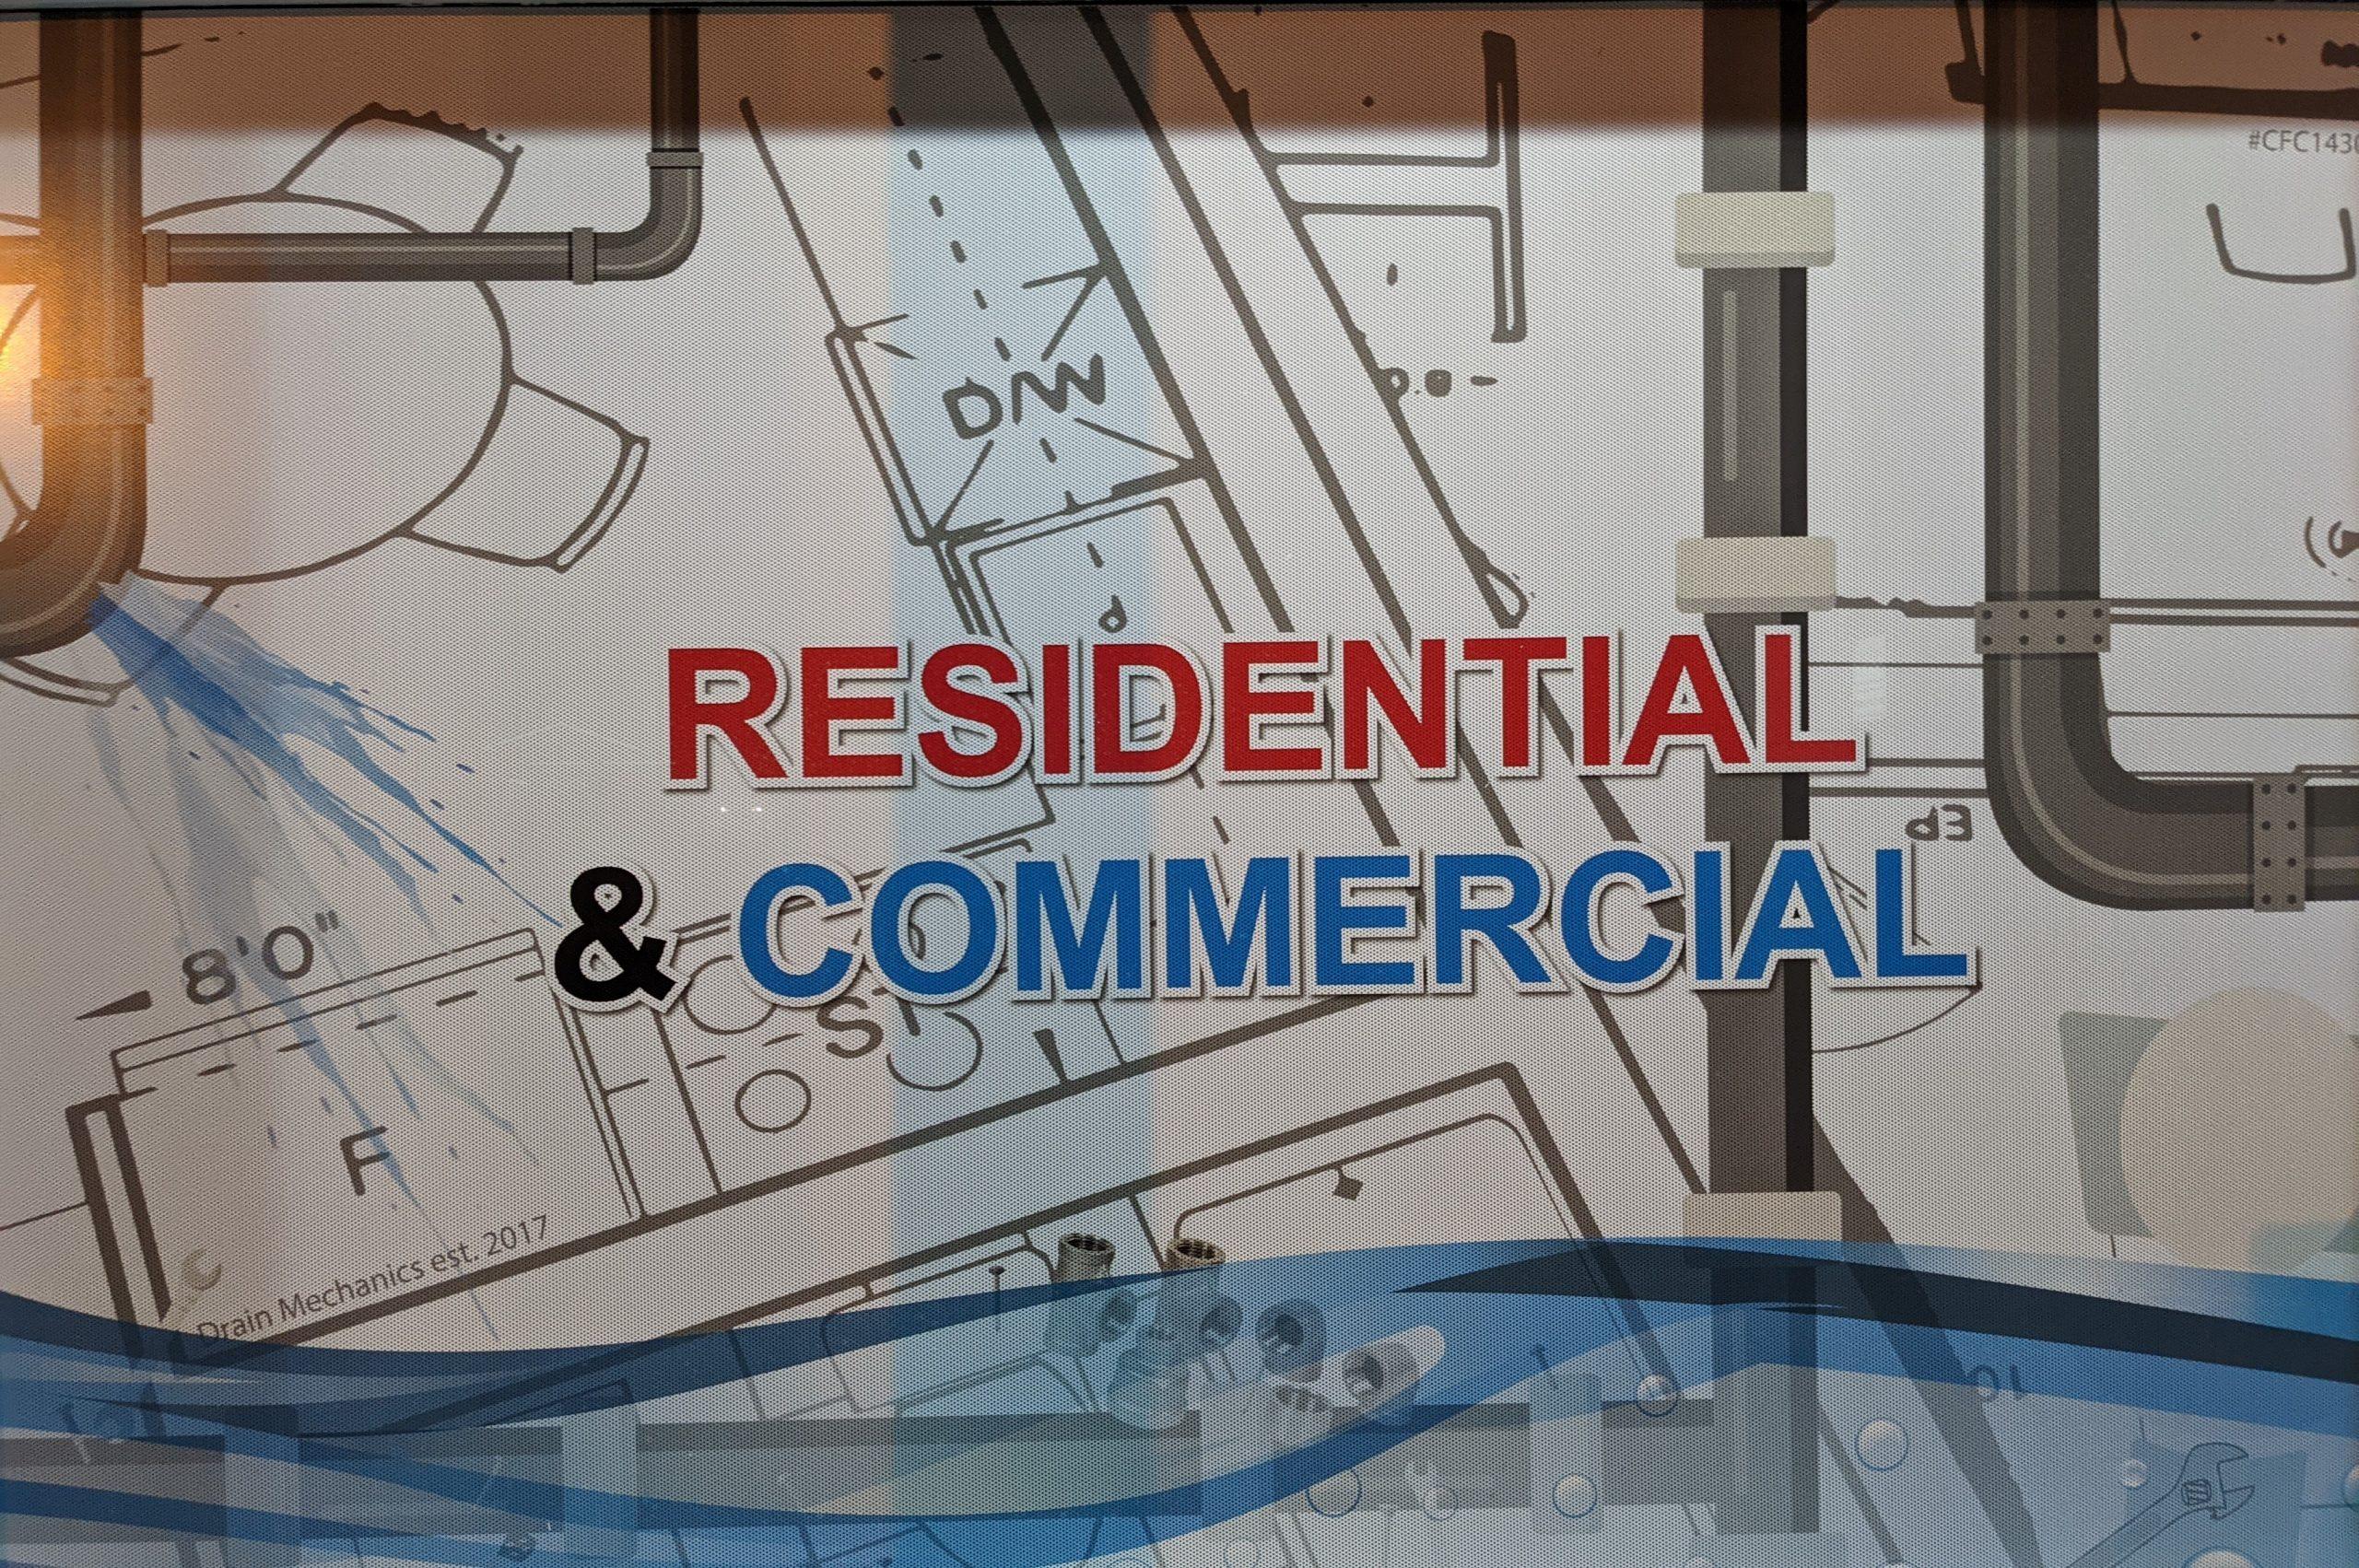 https://www.drainmechanics.com/wp-content/uploads/2021/03/residentialandcommercialplumbing-scaled.jpg